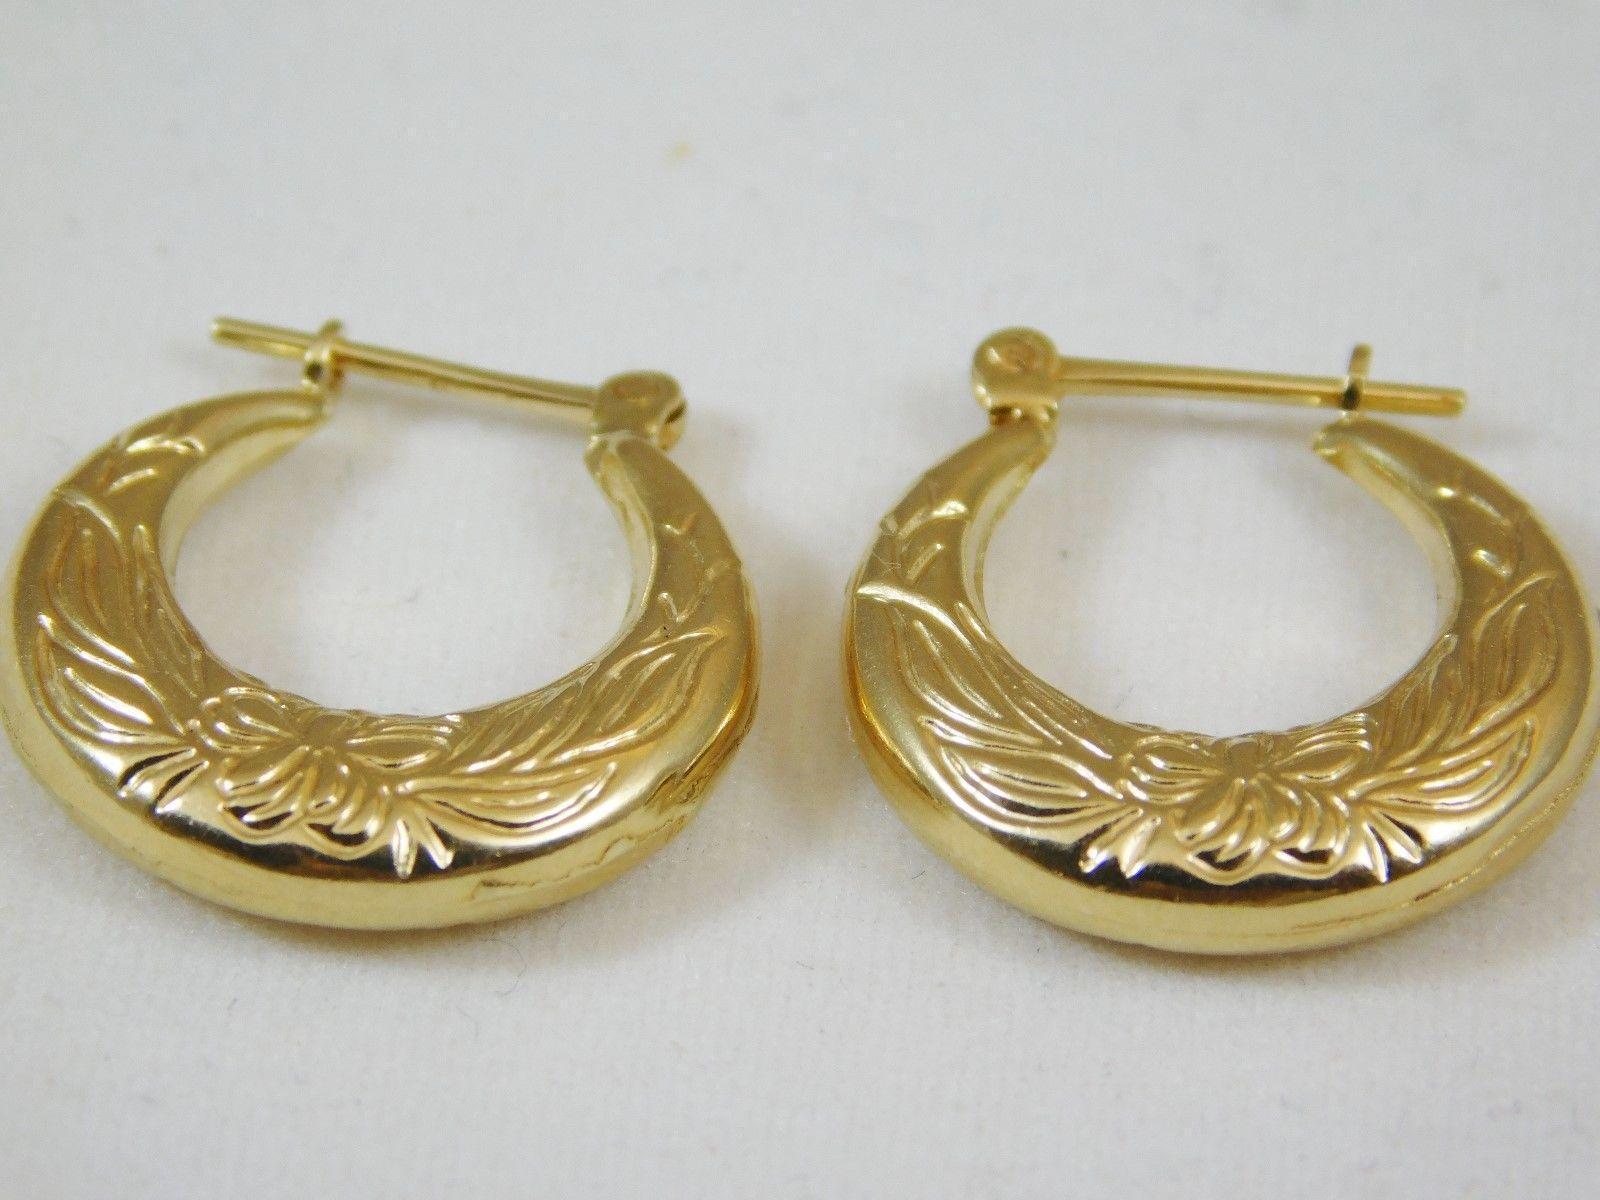 Karat Yellow Gold Small Hoop Earrings